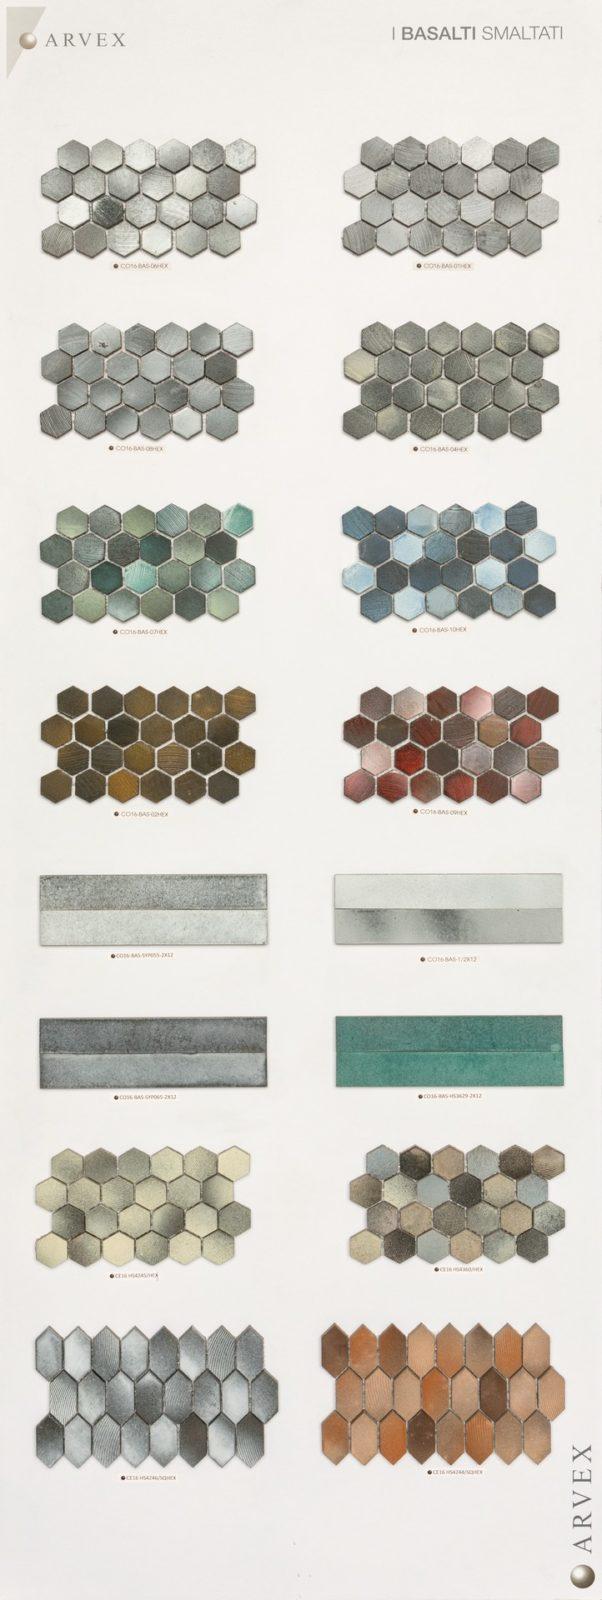 Mosaico - I Basalti Smaltati 01